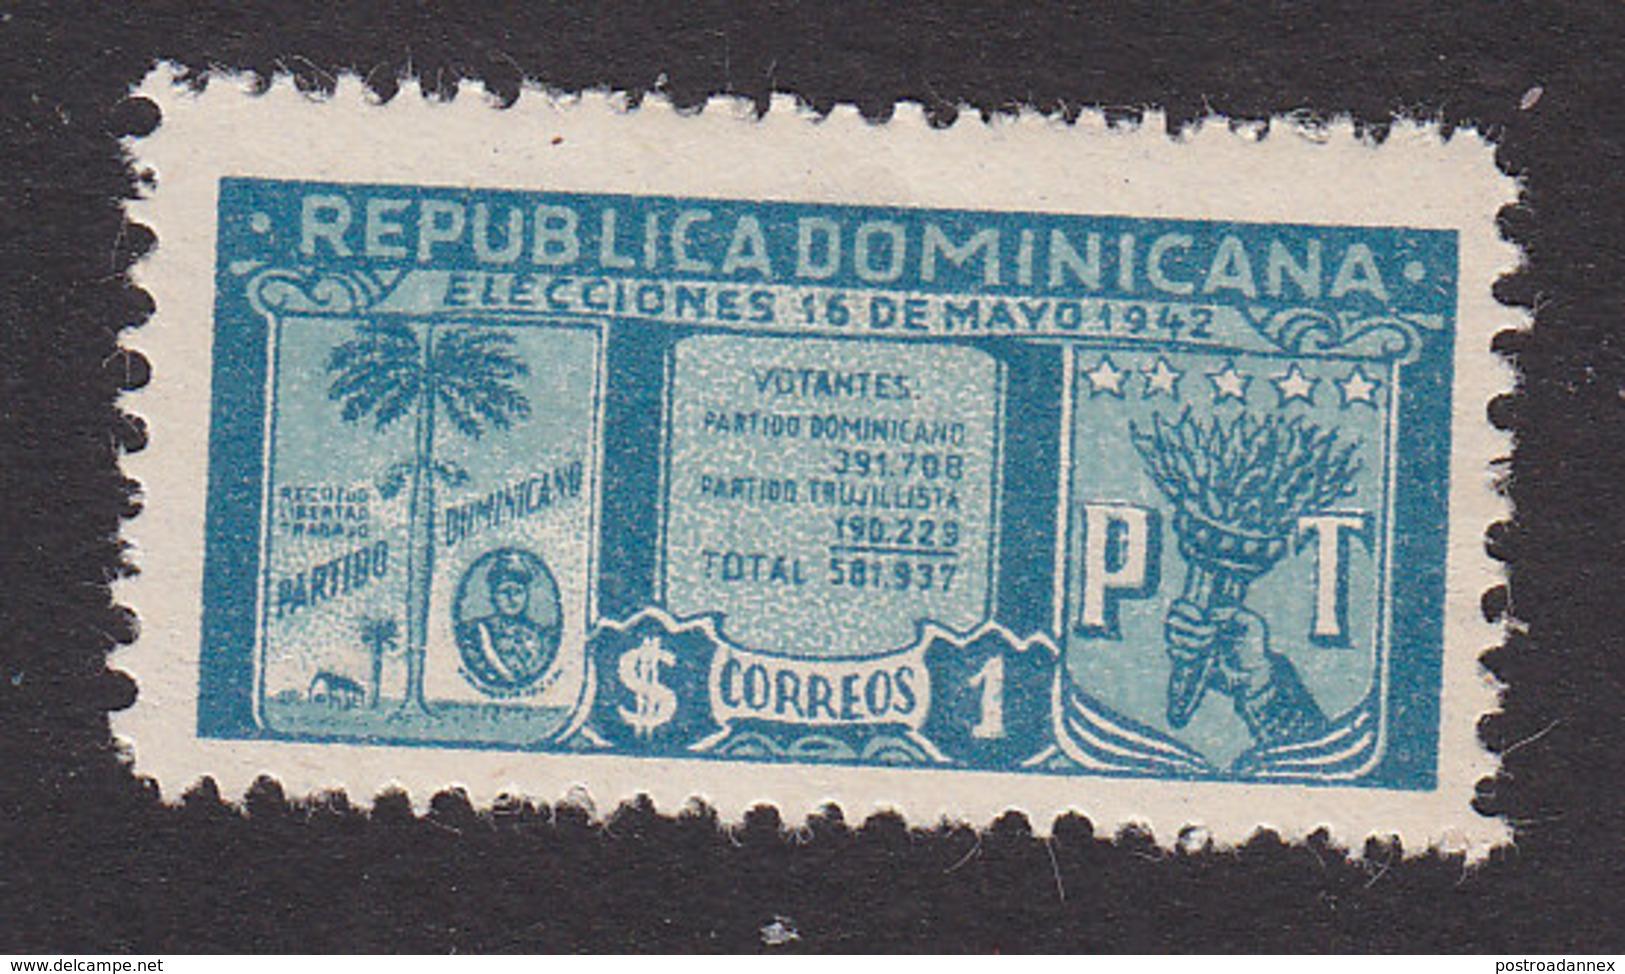 Dominican Republic, Scott #396, Mint Hinged, Re-election Of Trujillo, Issued 1943 - Dominicaine (République)